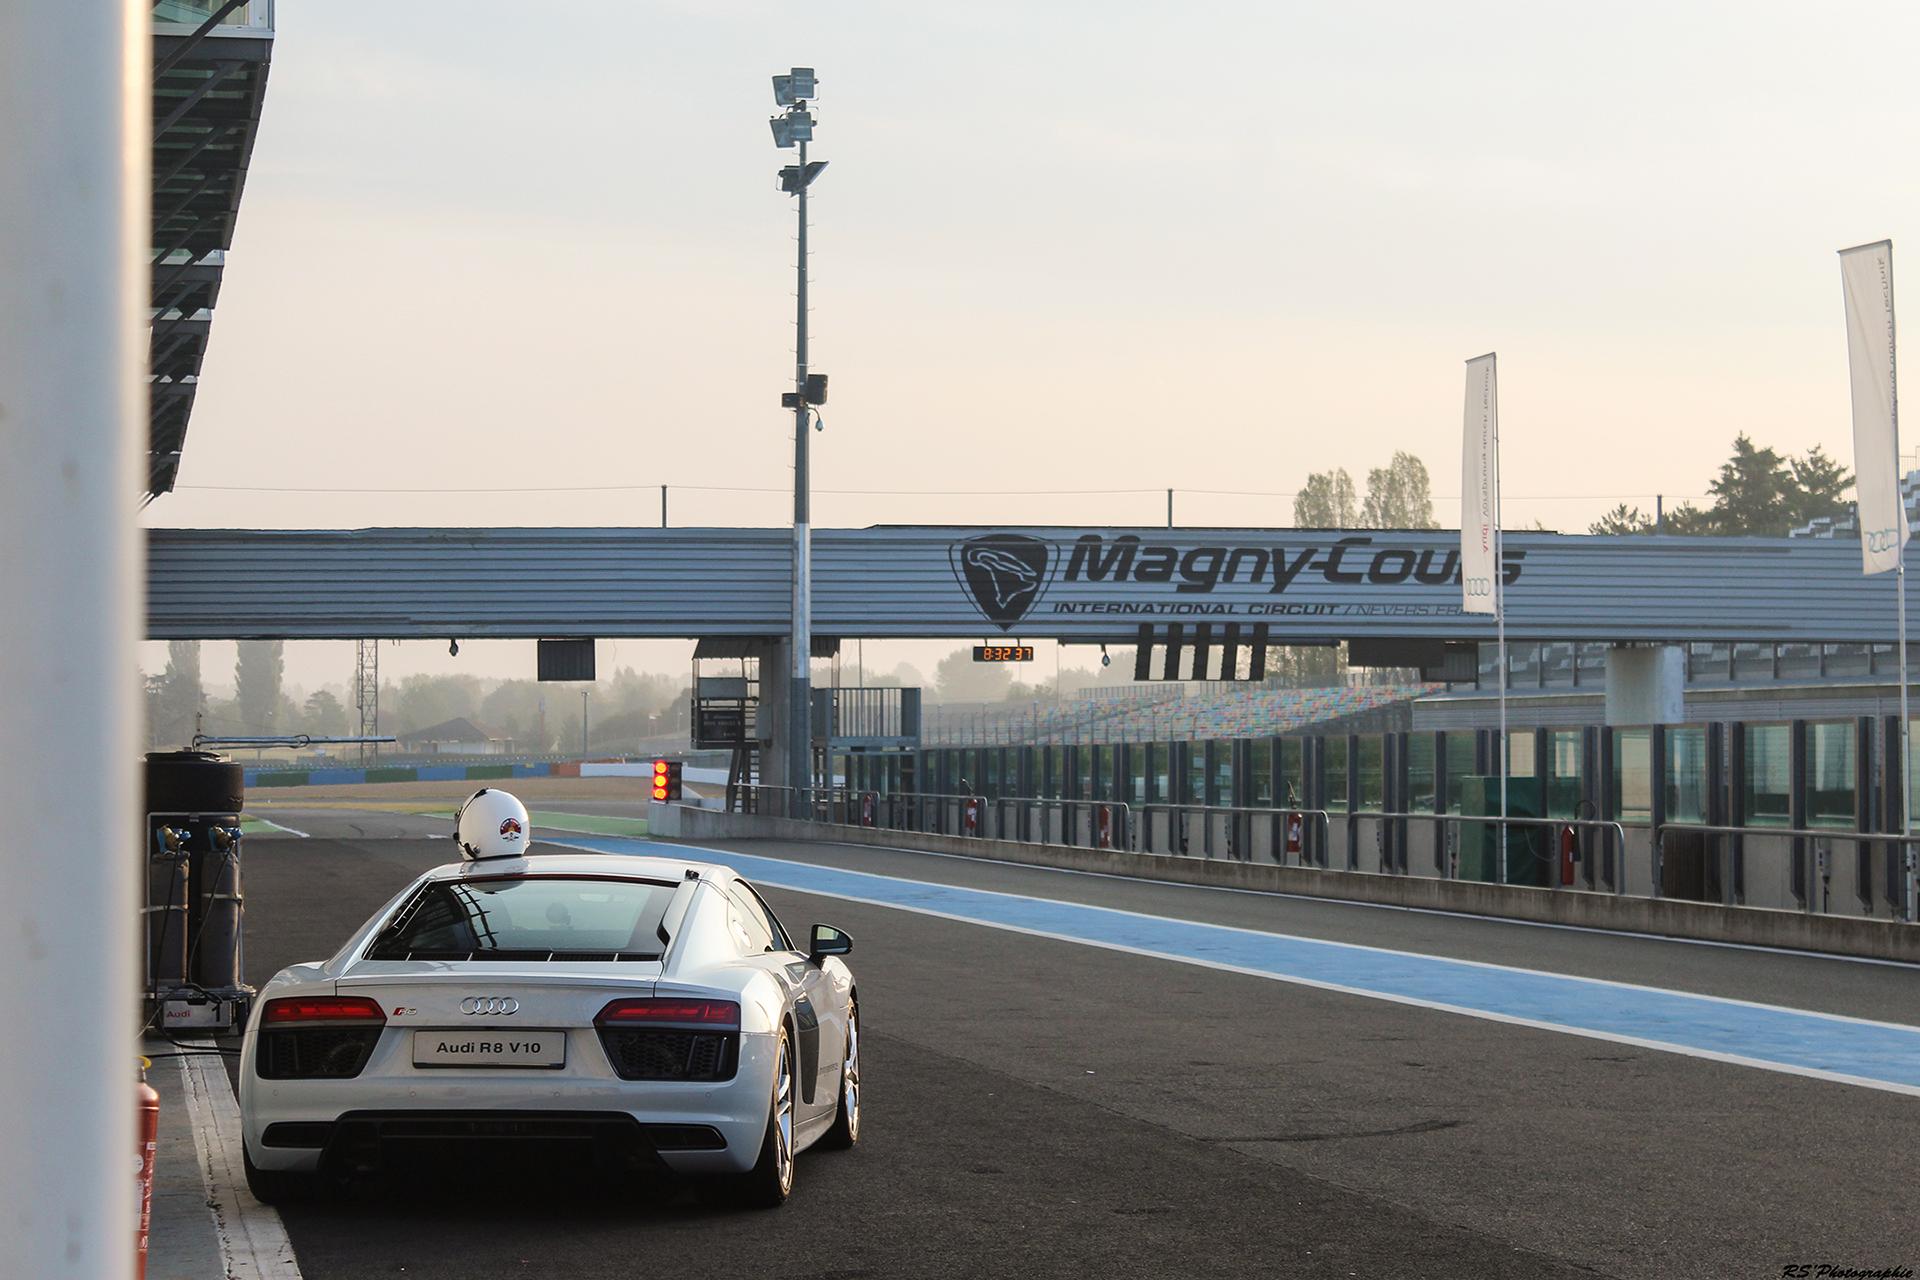 Audi R8 V10 Plus - arrière / rear - photo Arnaud Demasier